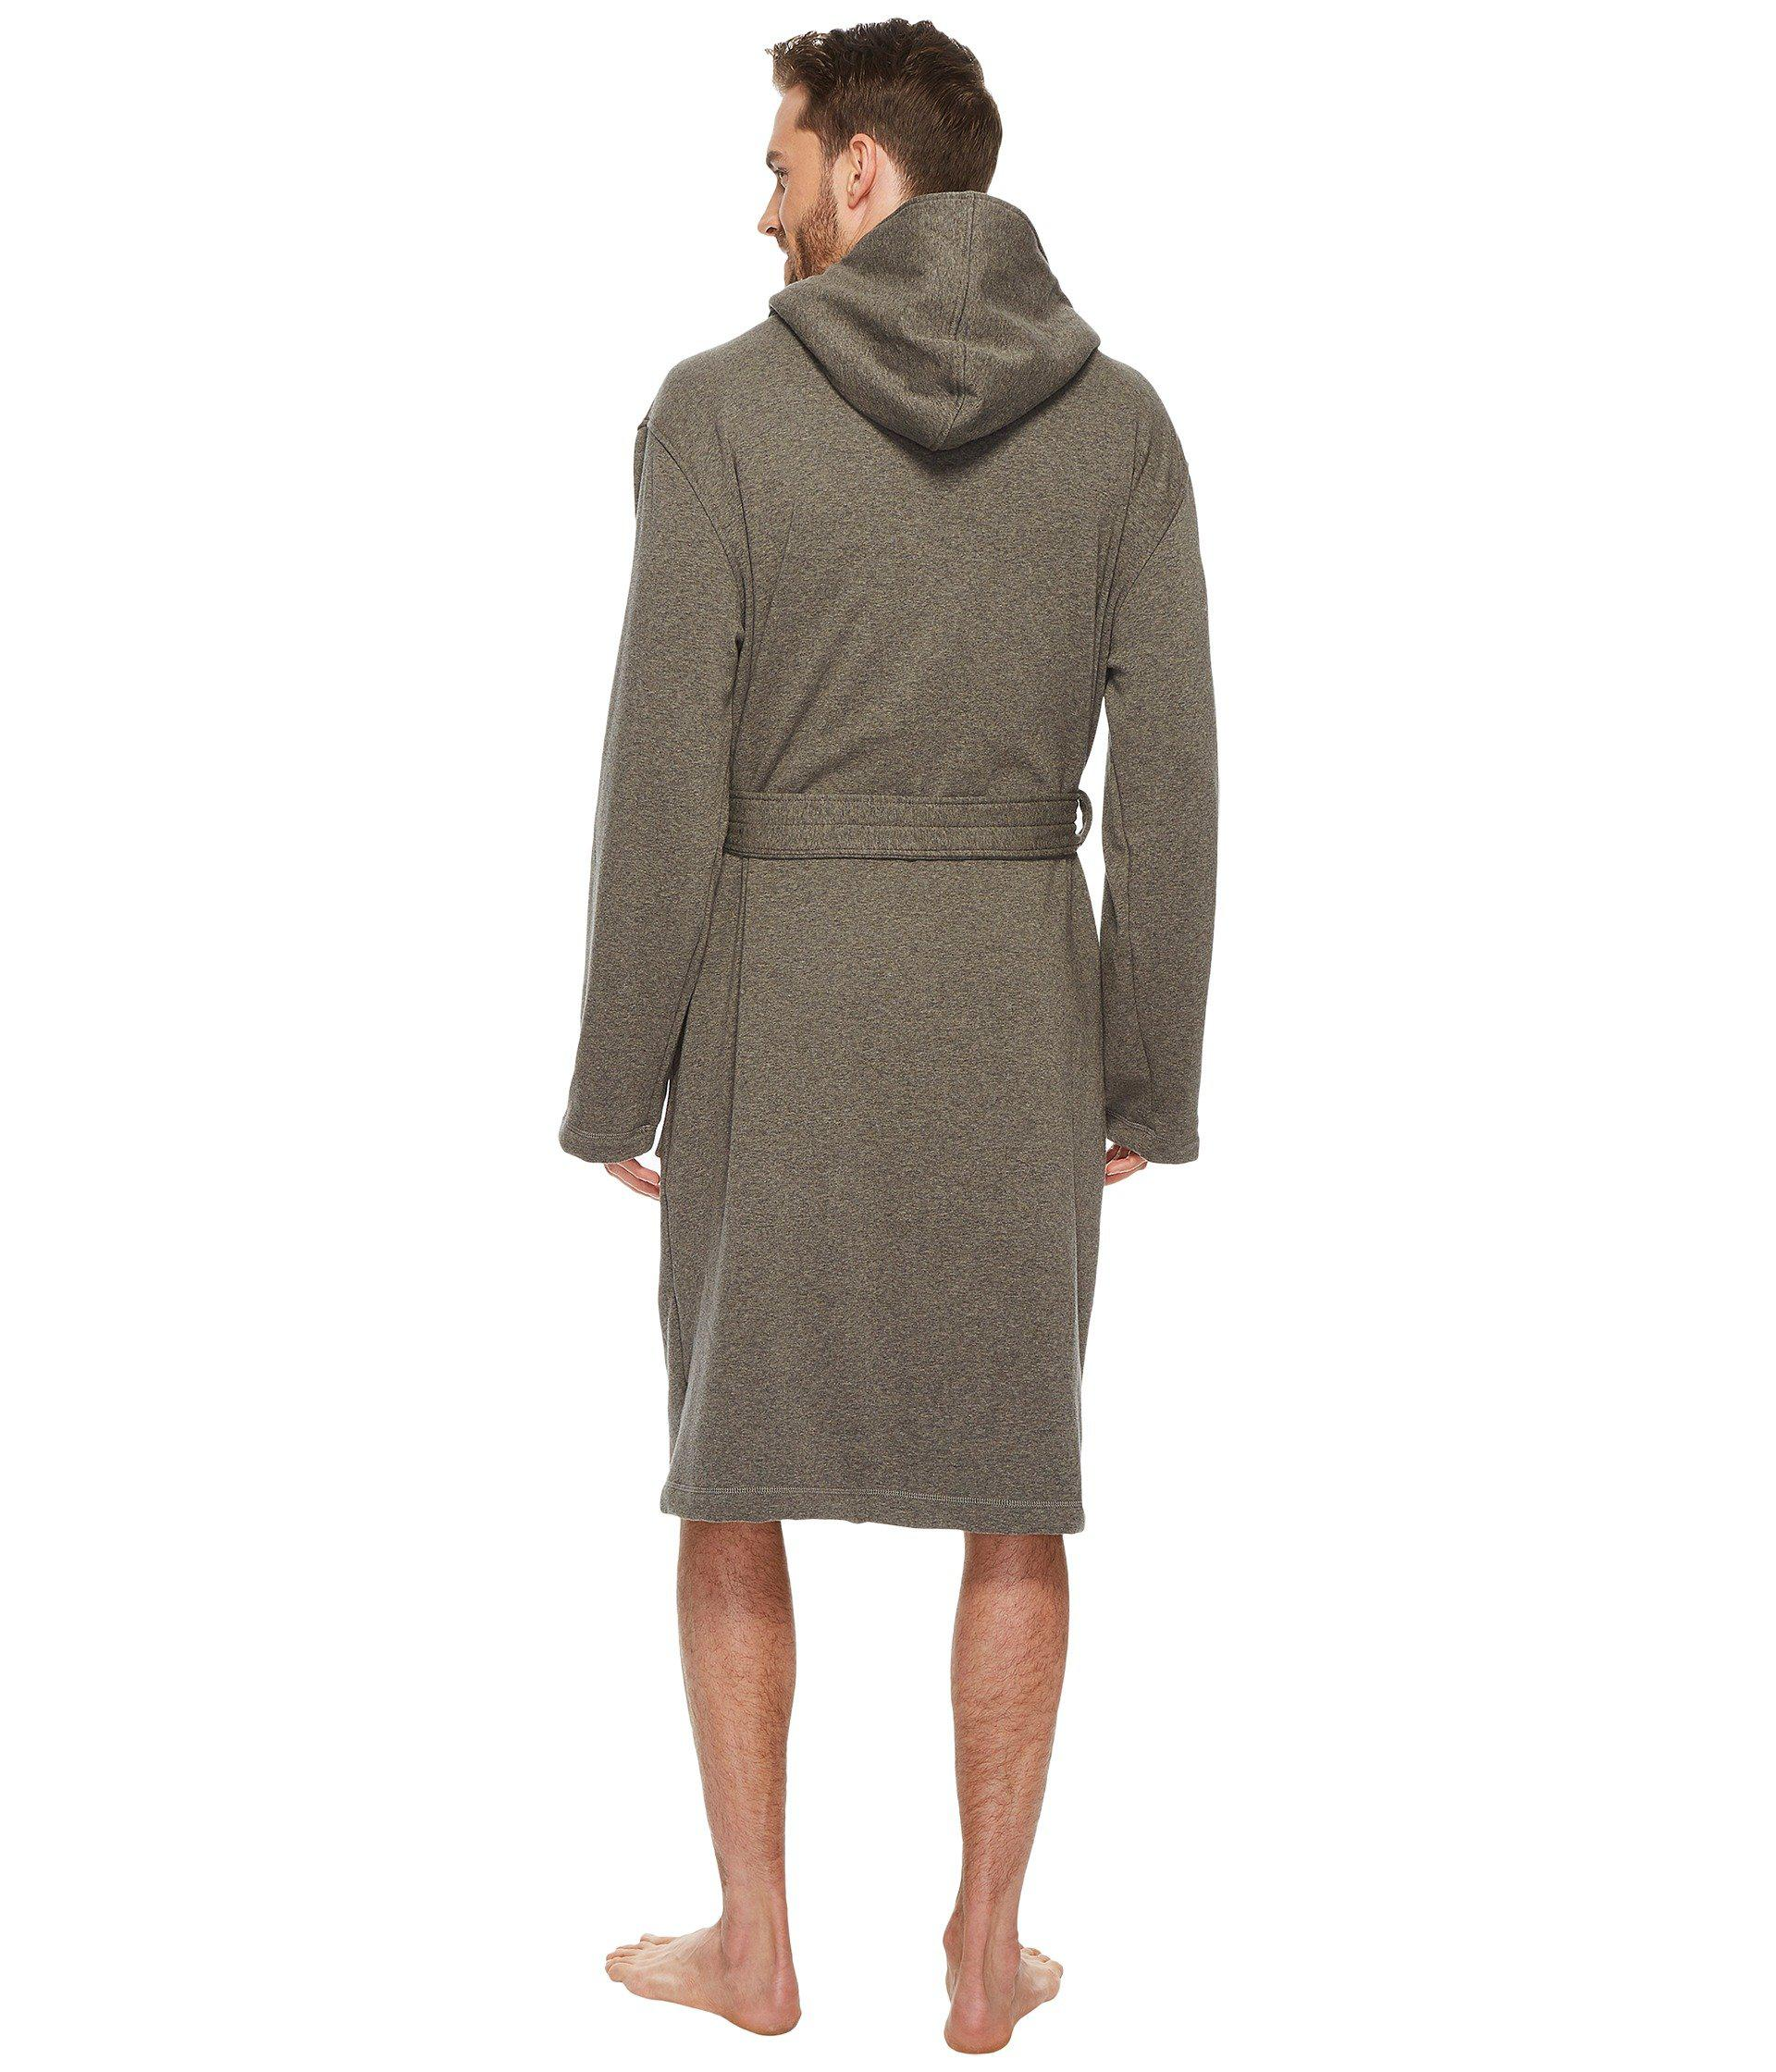 fba49fe54c Lyst - UGG Brunswick Robe (rock Ridge Heather) Men s Robe for Men